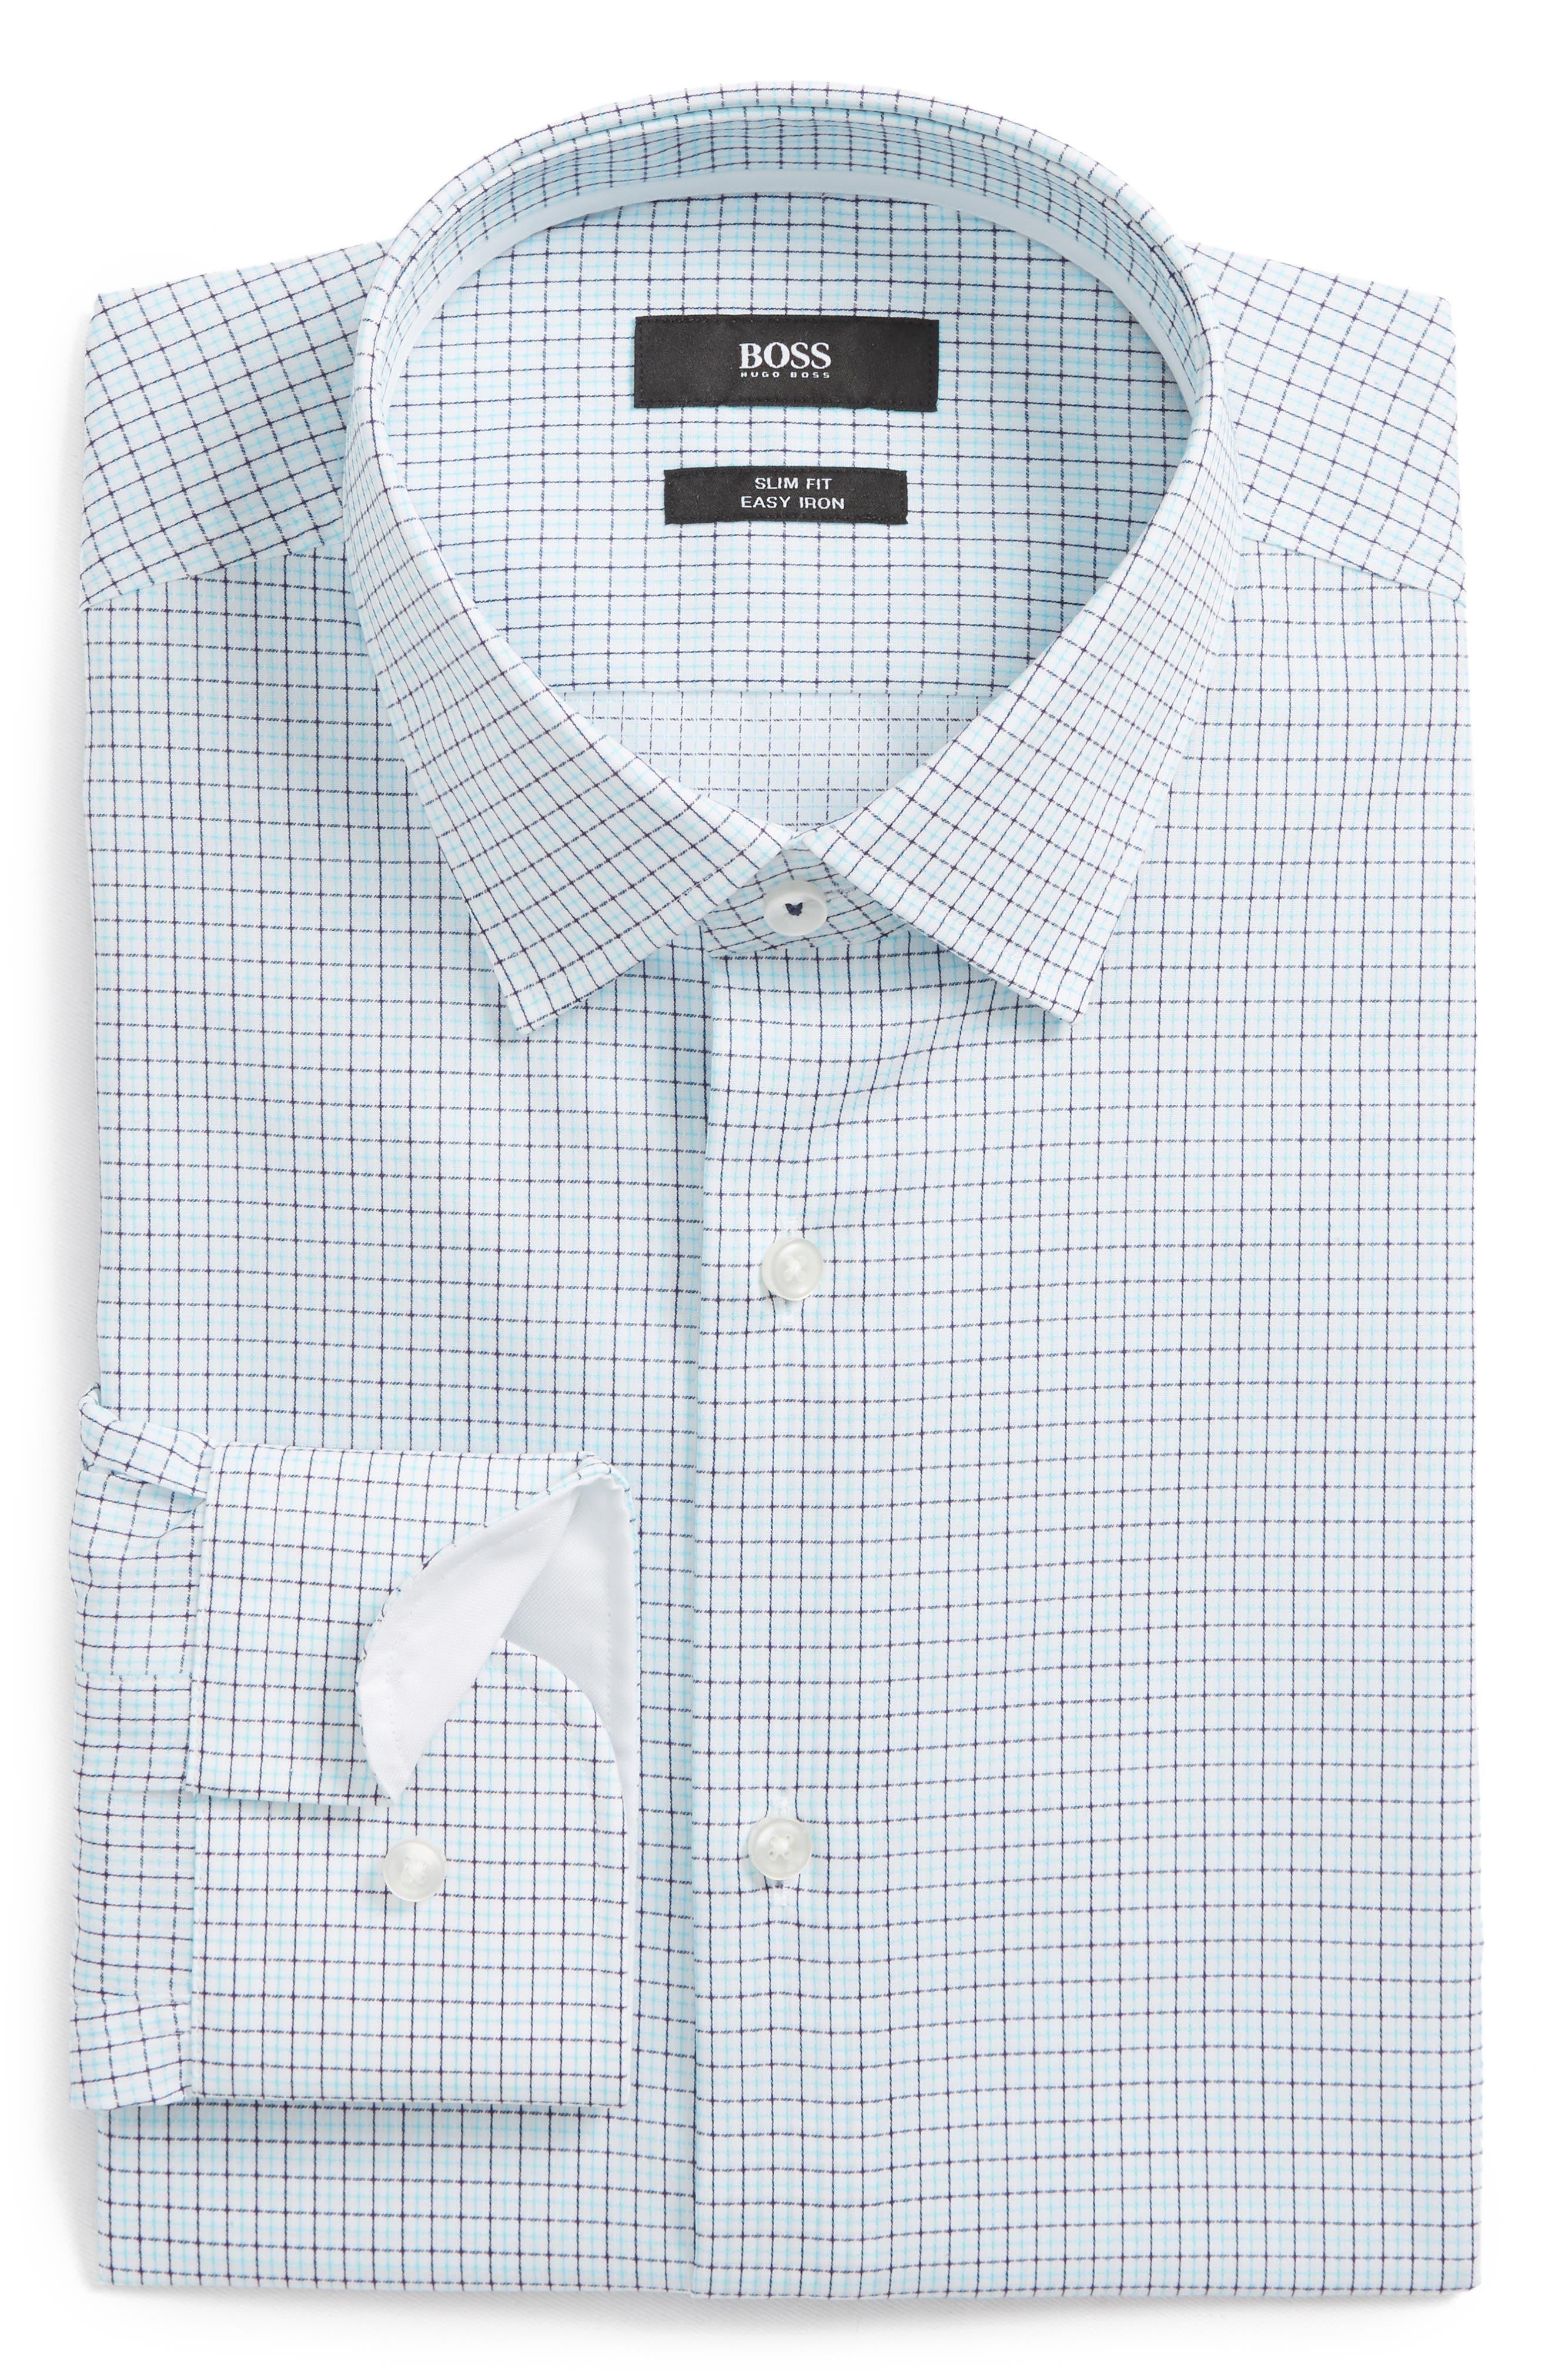 BOSS Jesse Slim Fit Easy Iron Check Dress Shirt